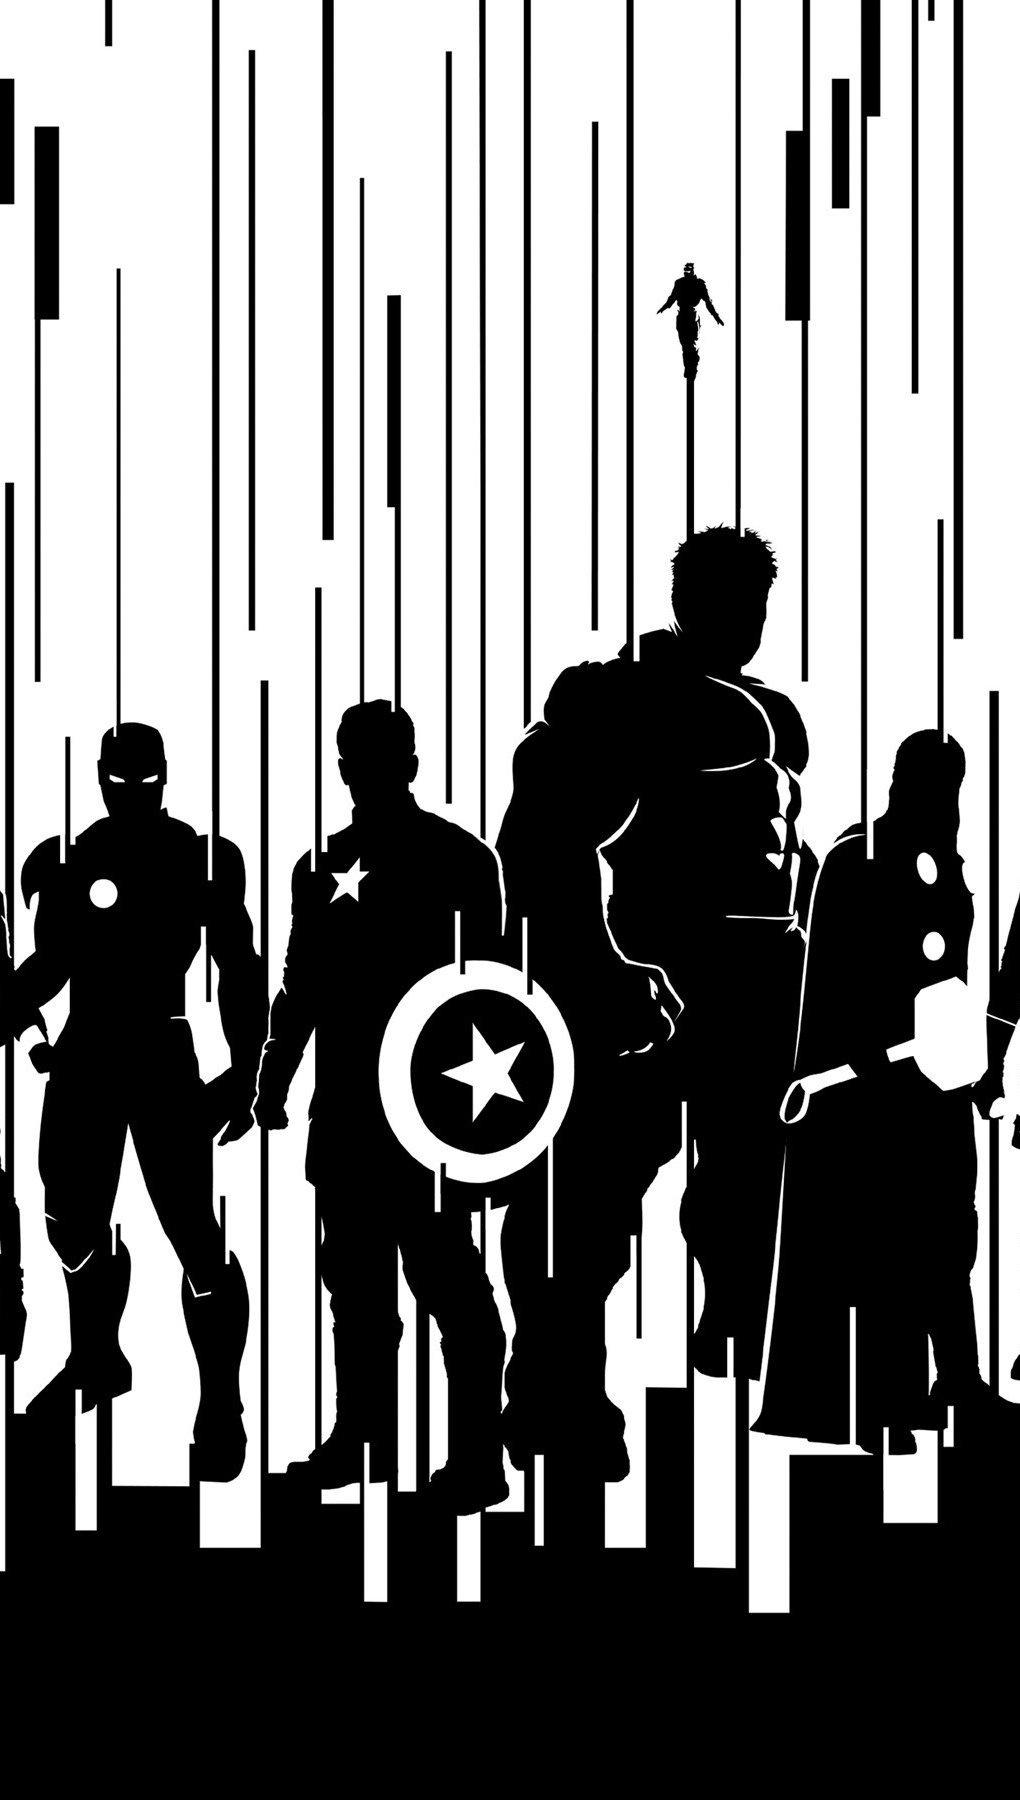 Wallpaper Shadows of the Avengers Vertical